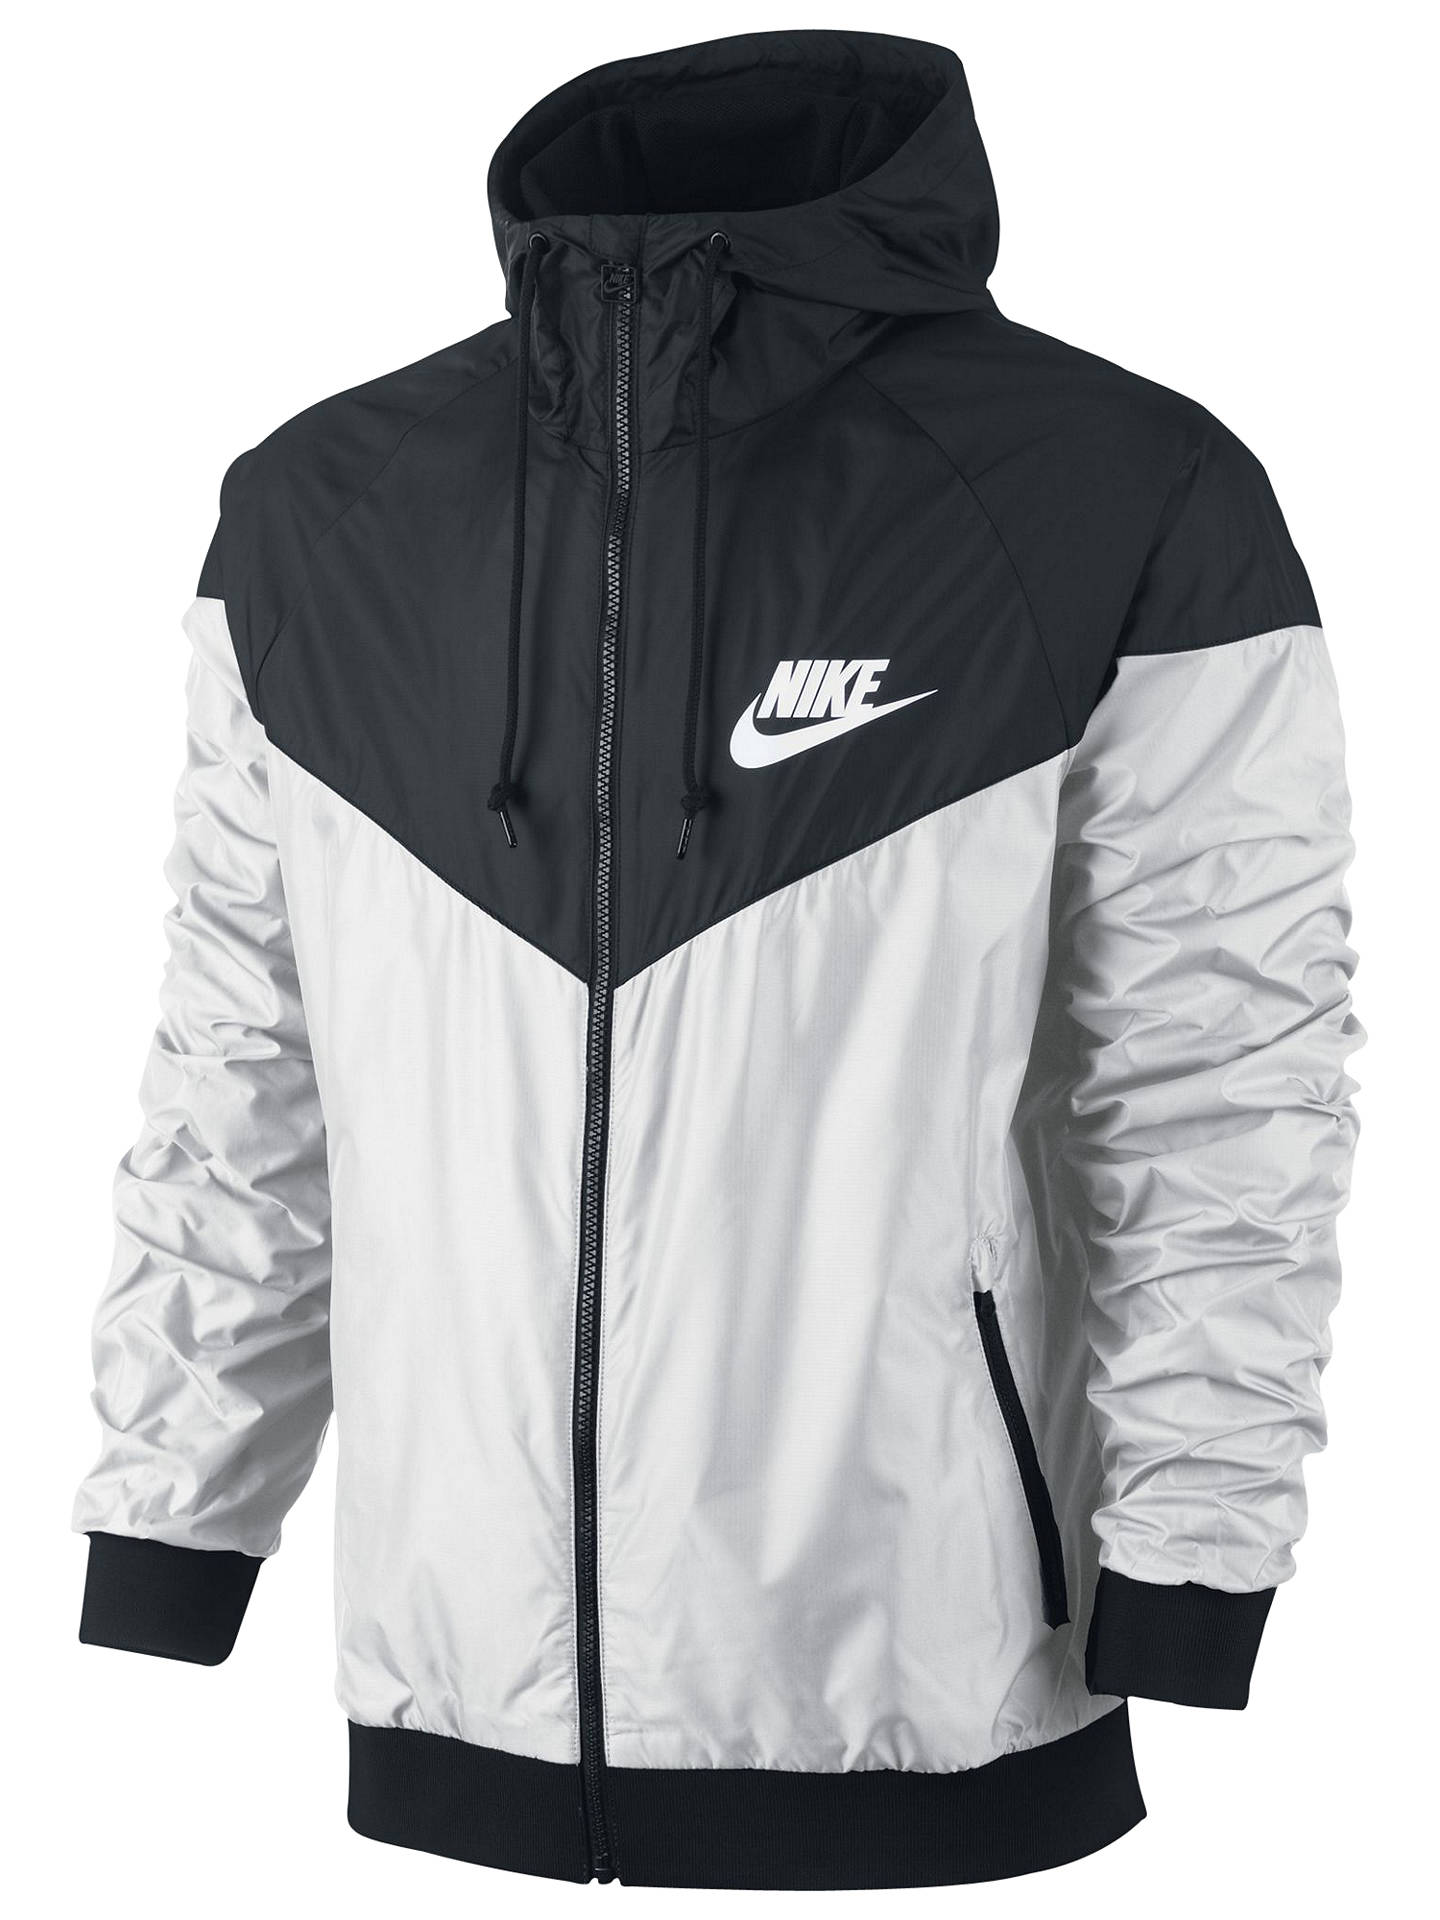 0d60ce678d75 Nike Windrunner Running Jacket at John Lewis   Partners